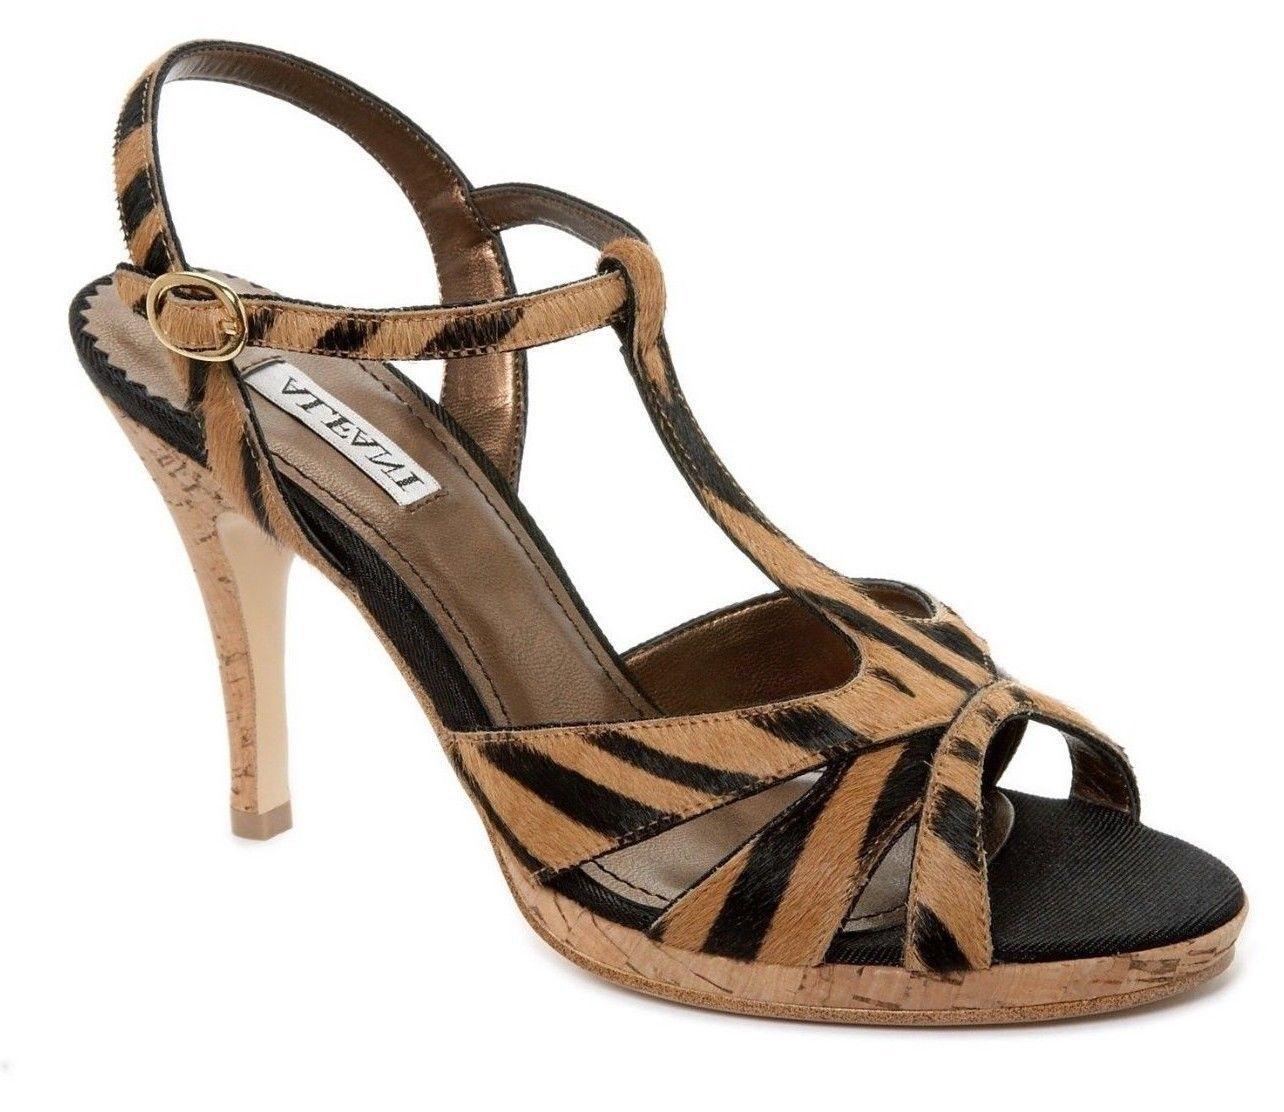 New ALFANI Damens Damens Damens Leder High Heel Pump Open Toe Sandale Slingback Schuhes Sz 8.5 M 33a0b1